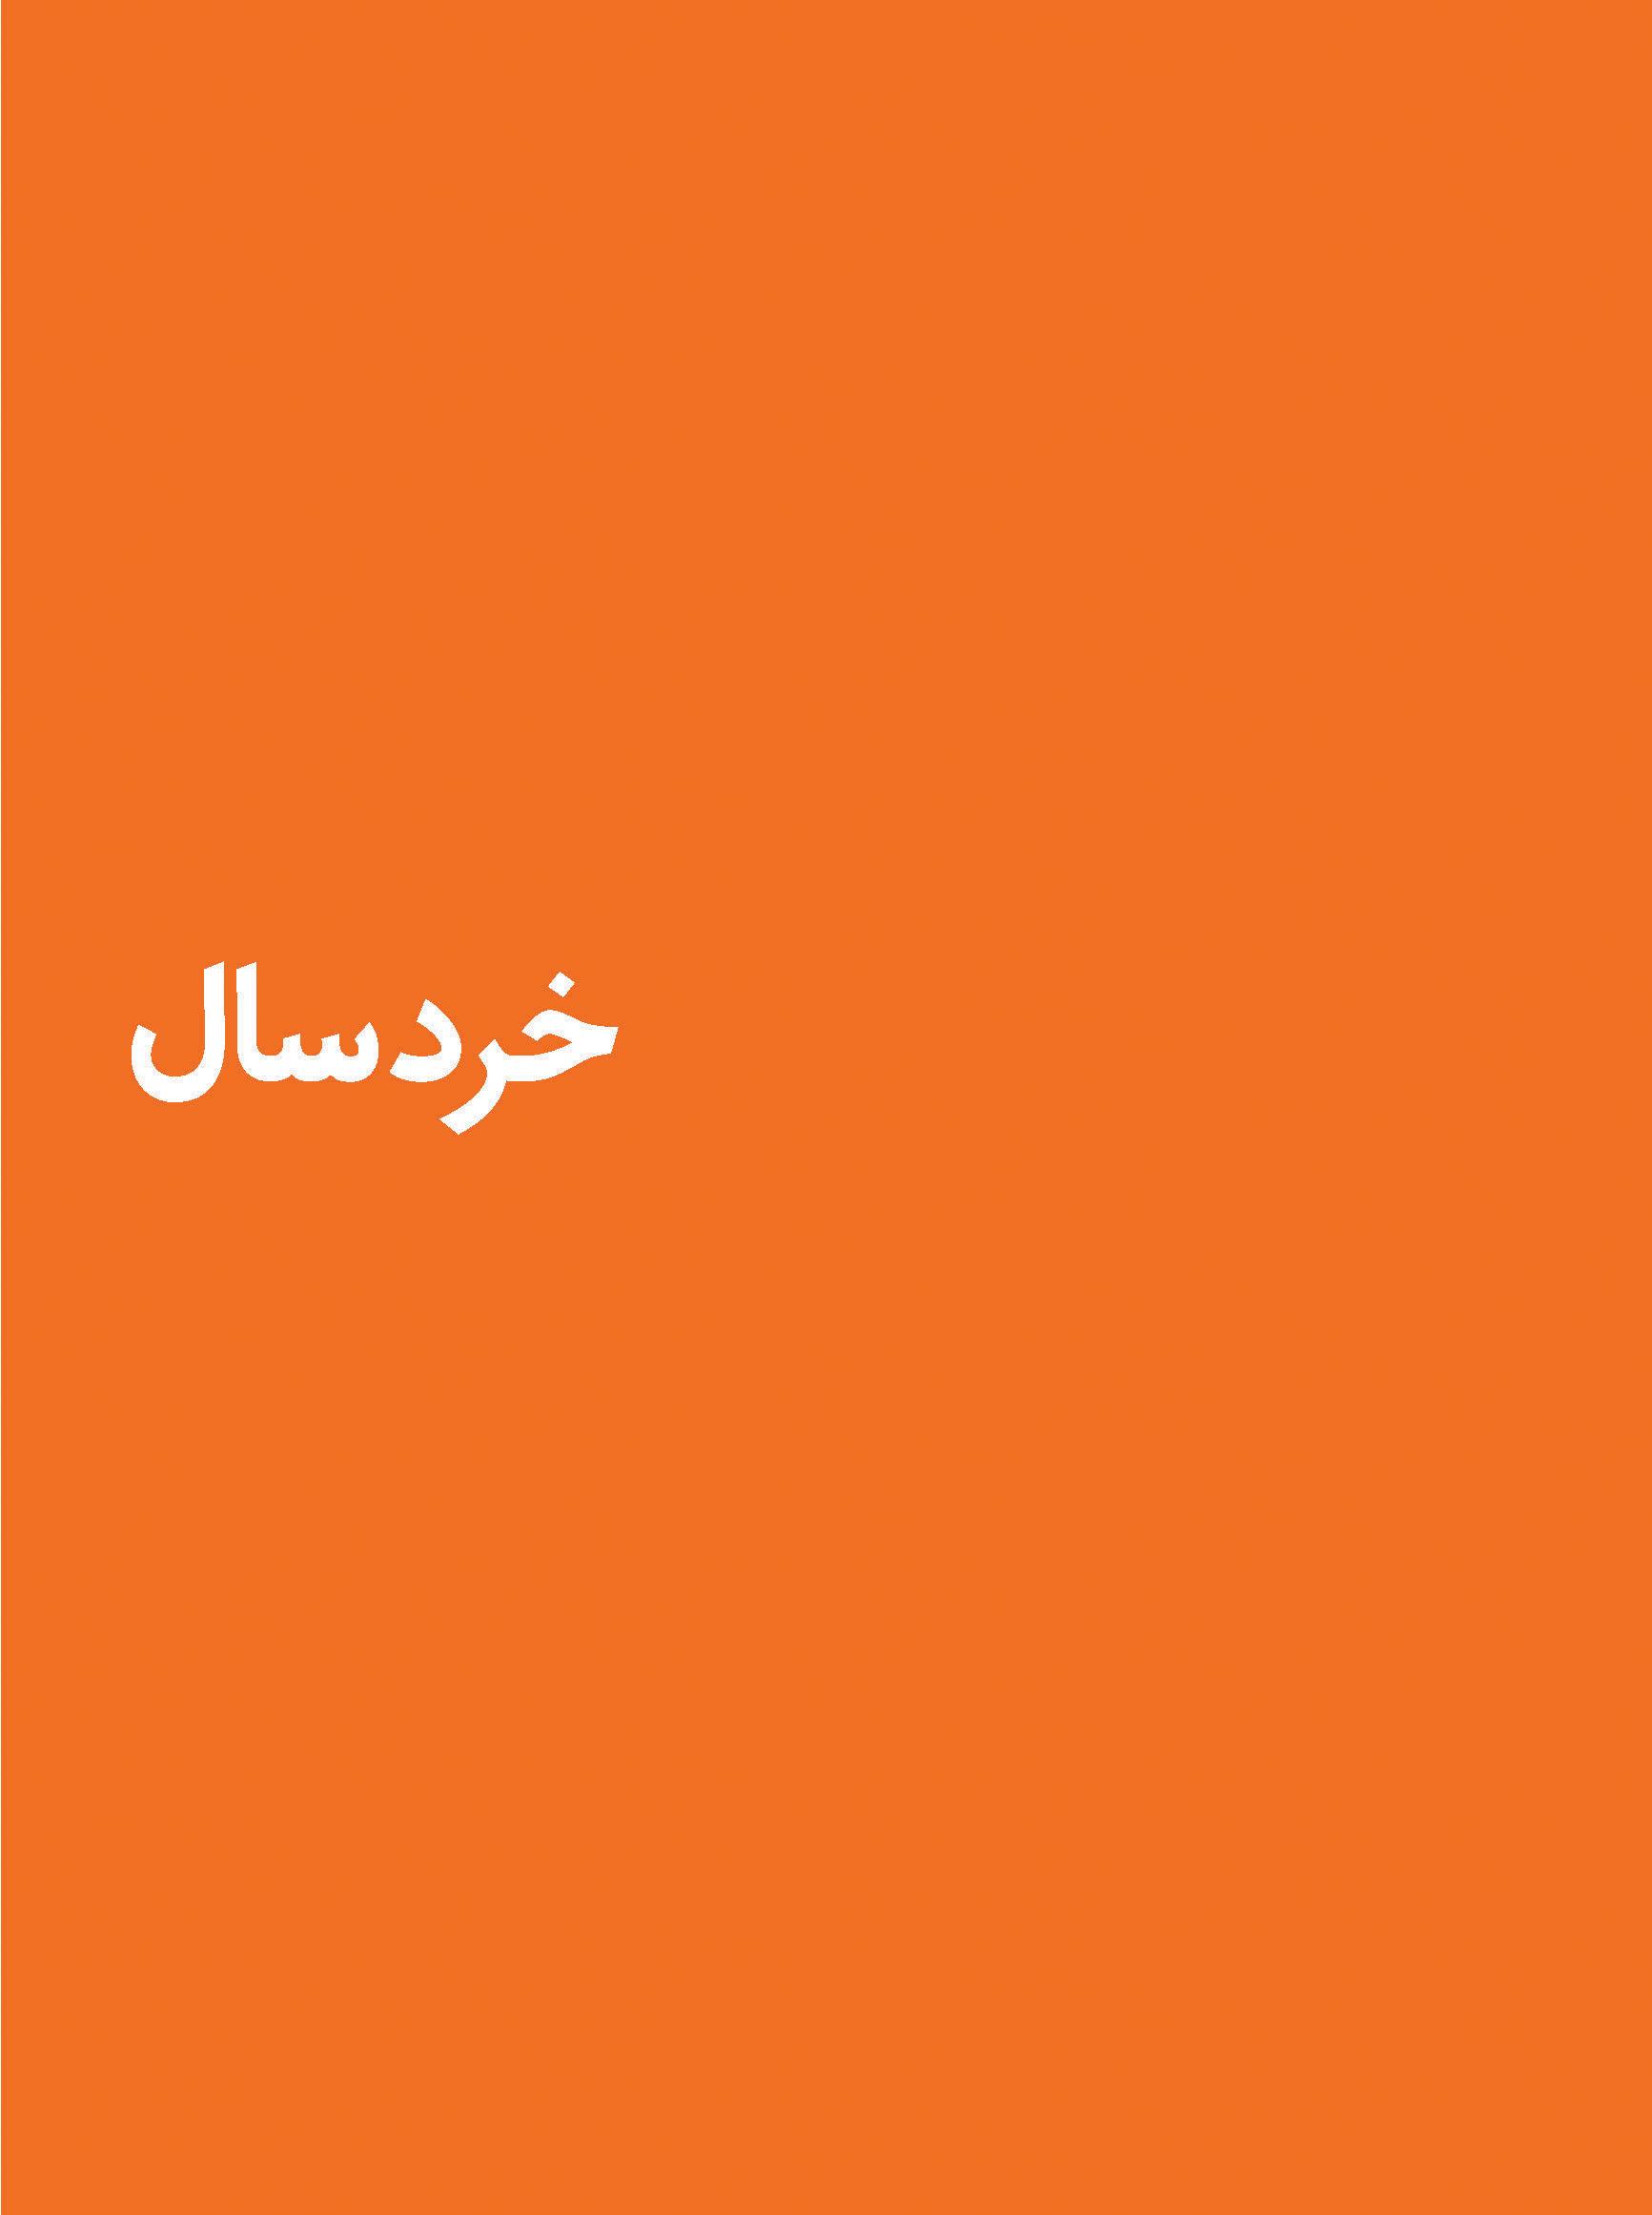 Khordsal